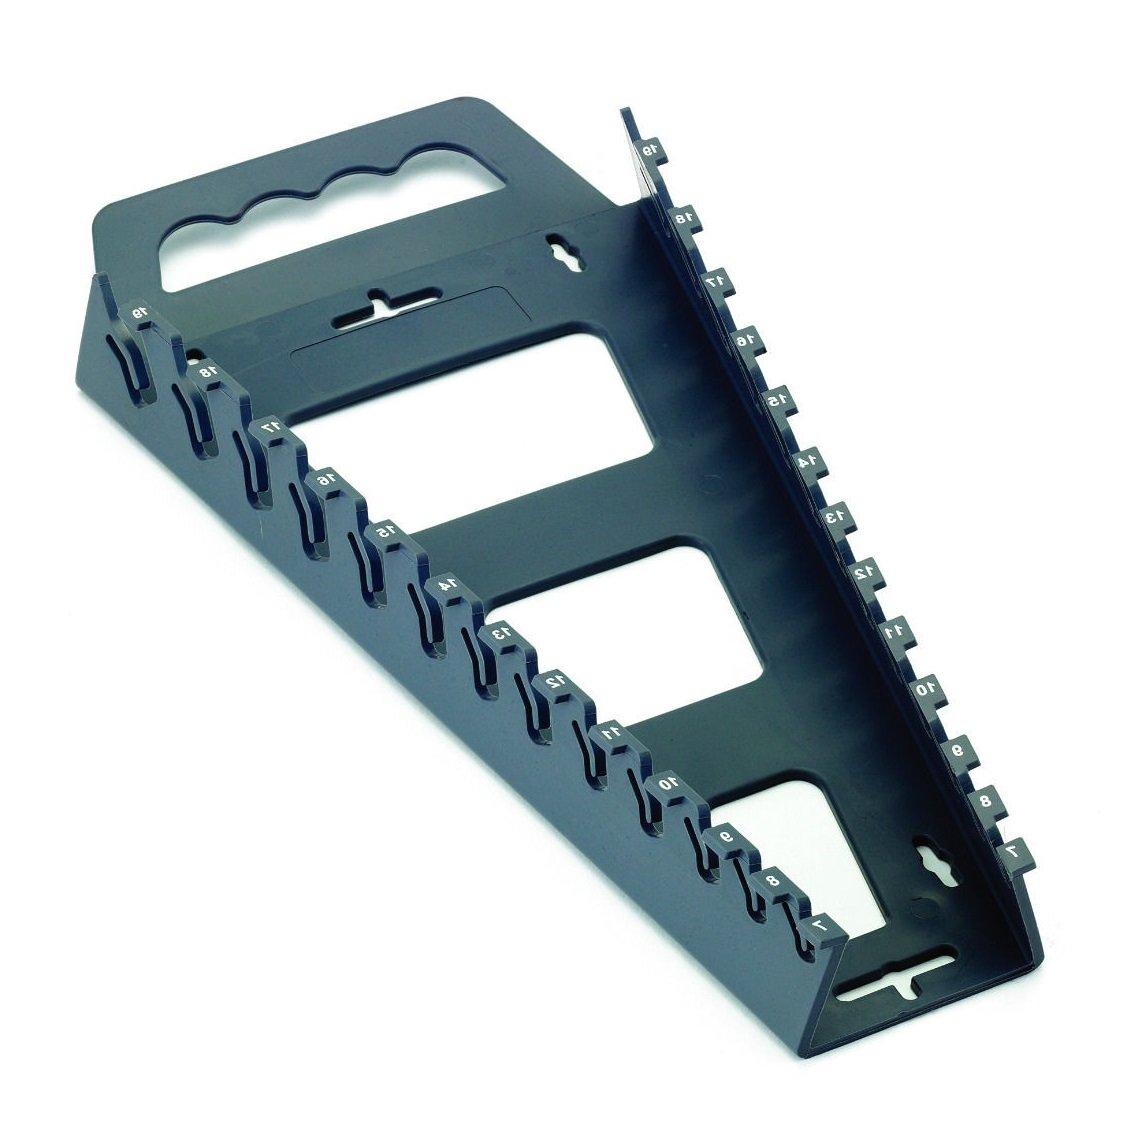 Hansen METRIC Quik Pik Wrenches Rack MM Organizer Holder USA Made 5302 Grey TKT-11